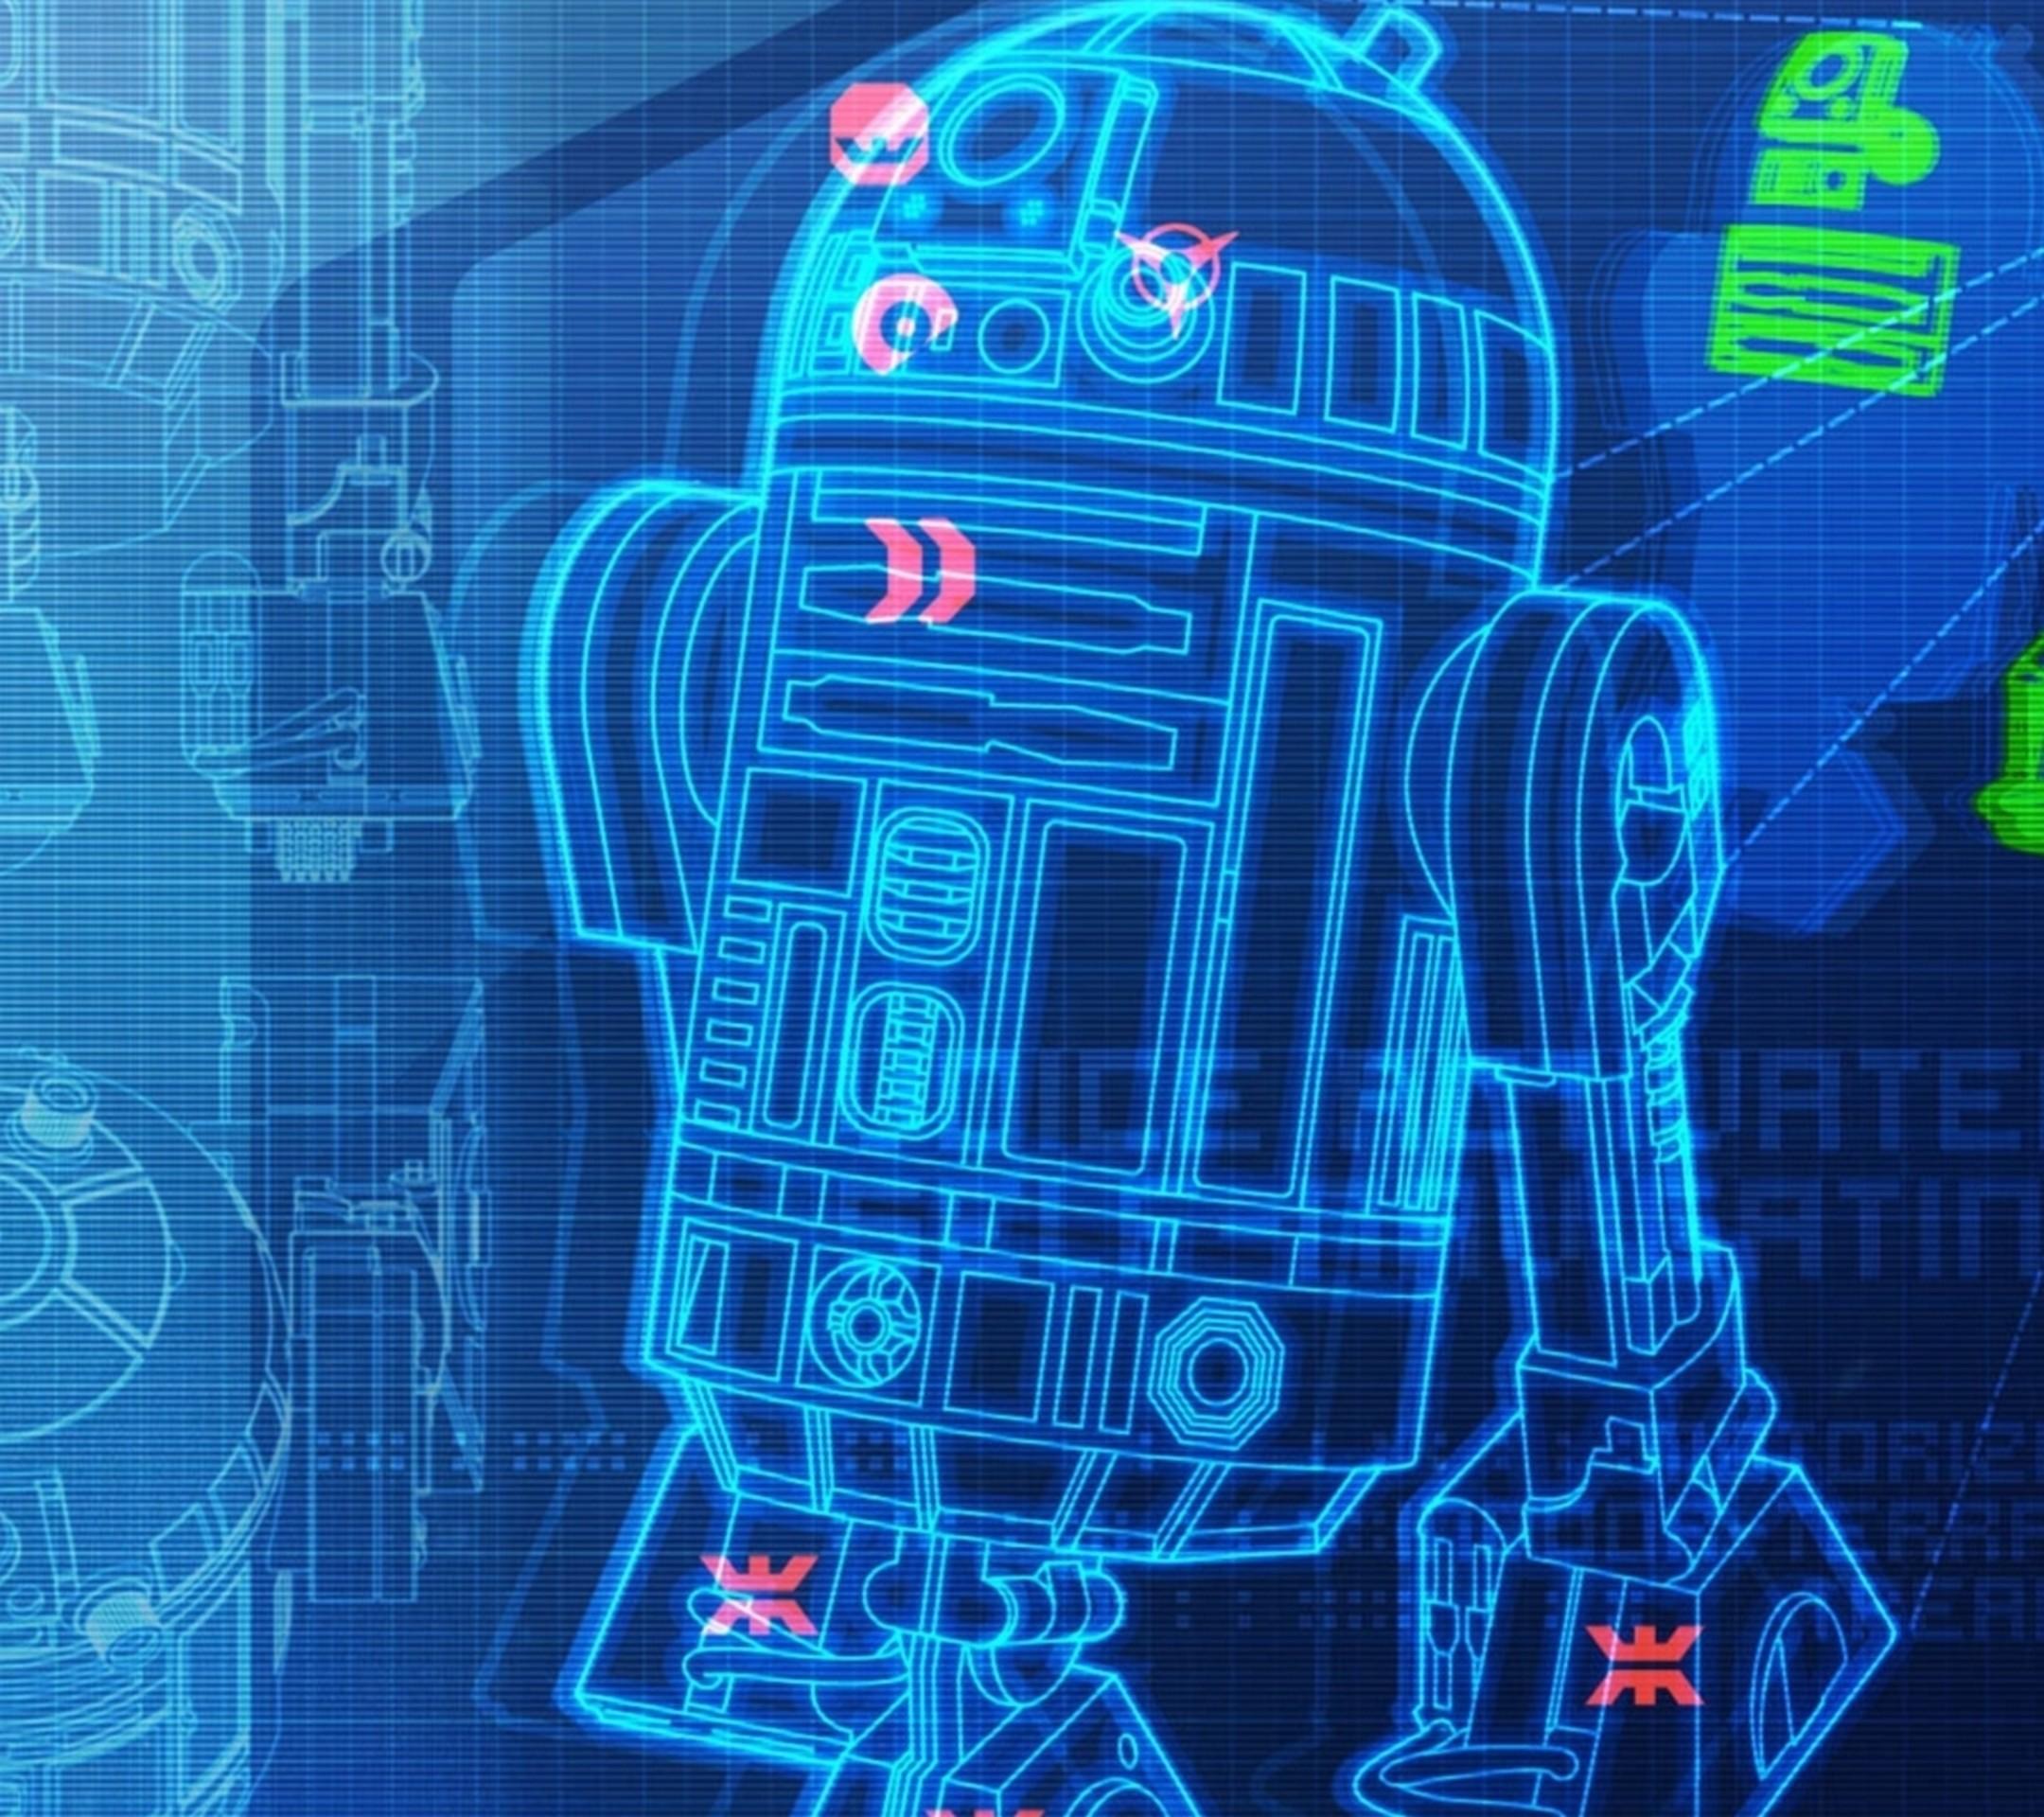 Explore Galaxy S3 Wallpaper, Star Wars Wallpaper, and more!